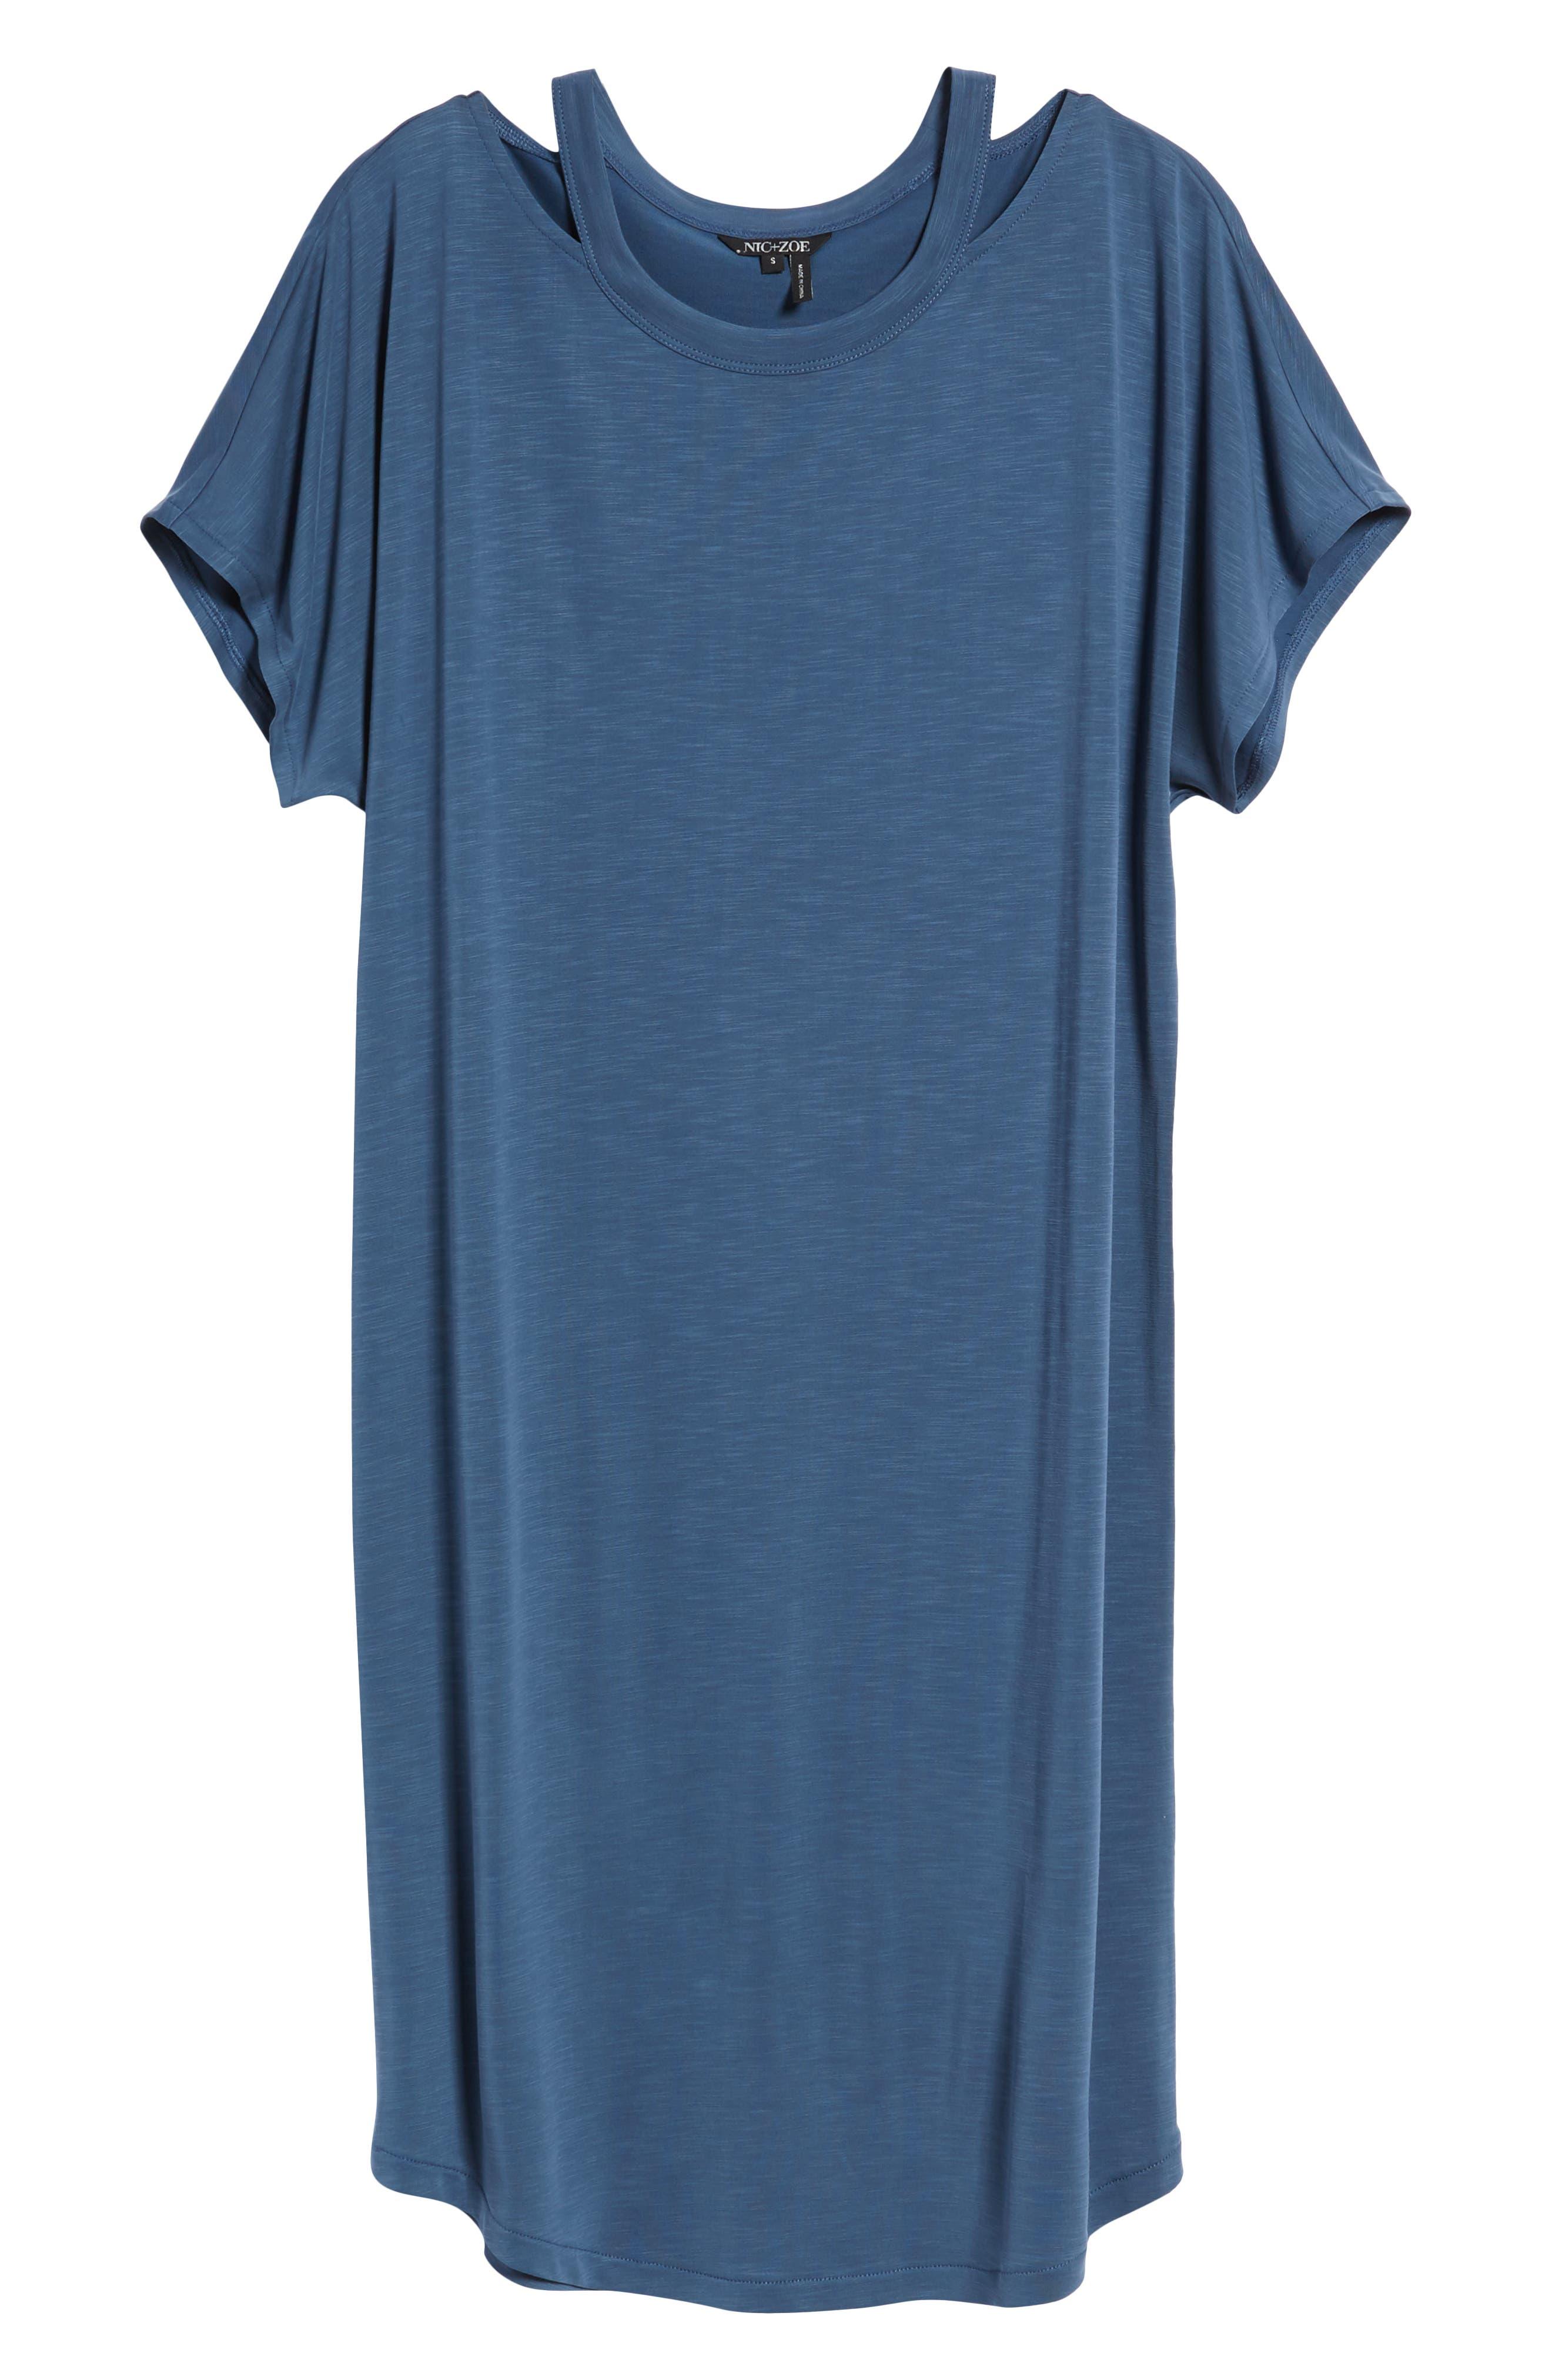 Open Road Dress,                             Alternate thumbnail 7, color,                             490